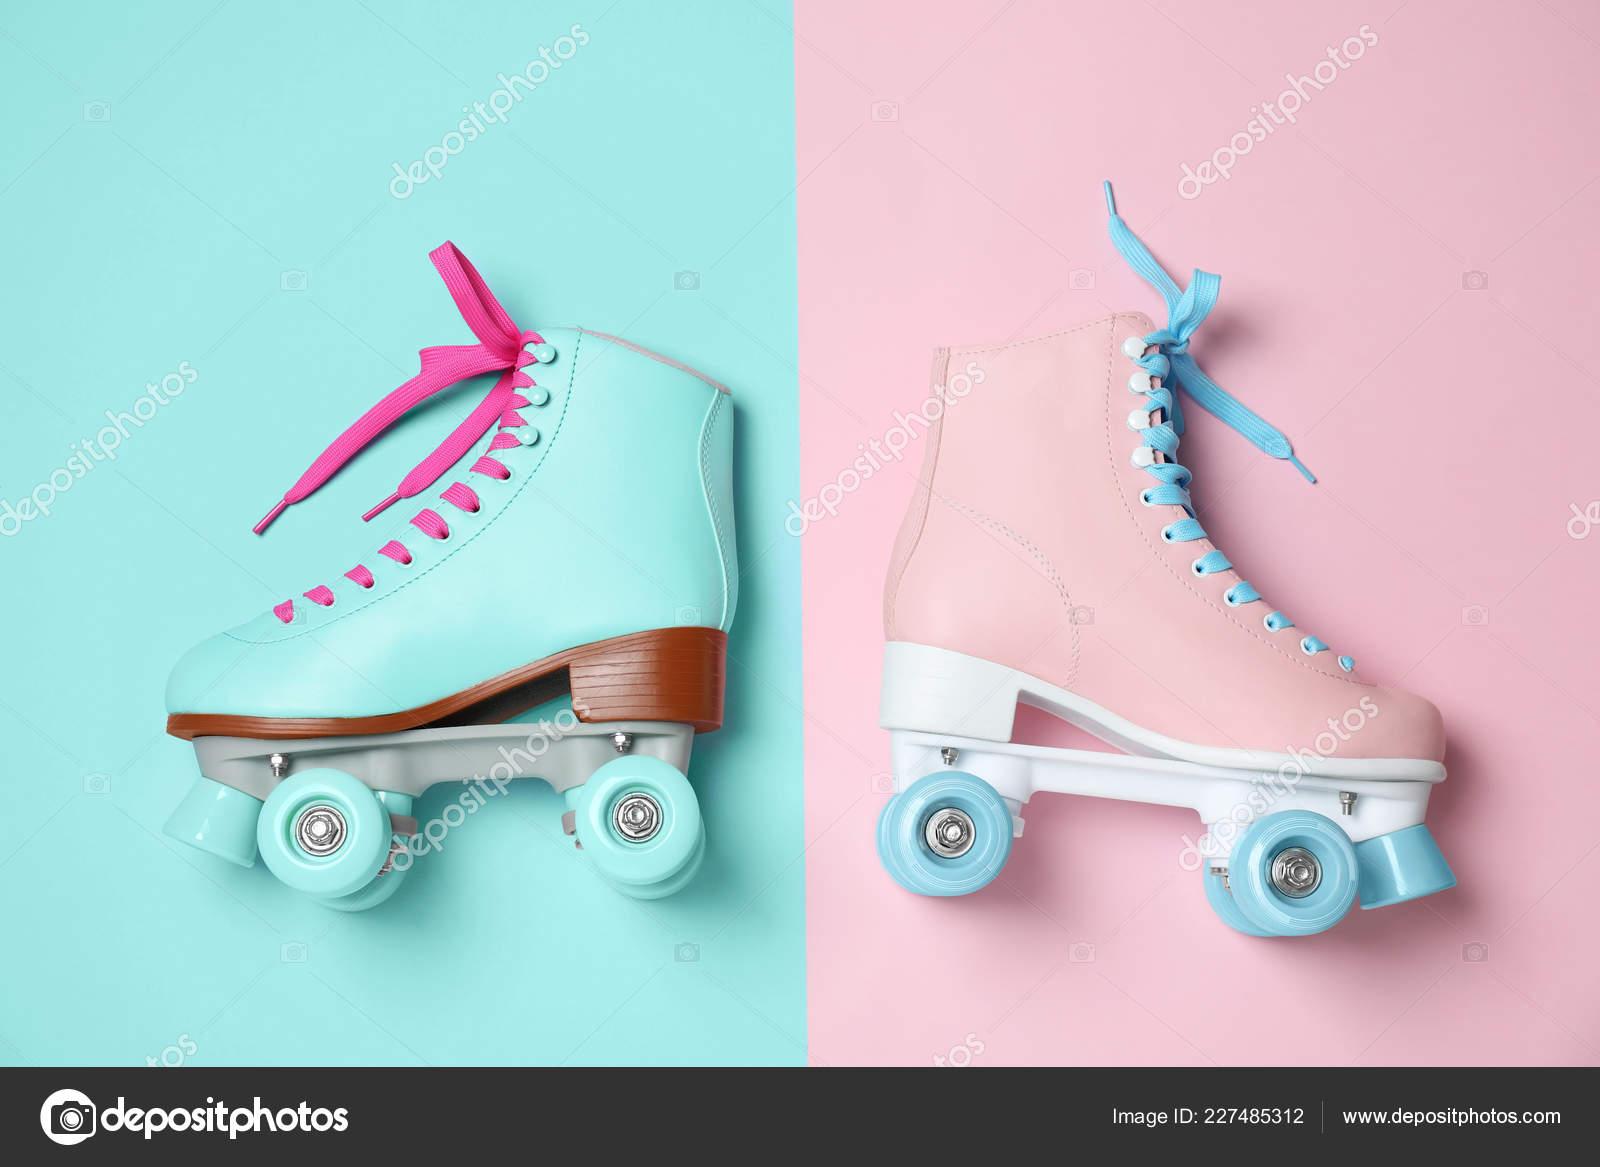 Vintage Roller Skates Color Background Top View Stock Photo C Liudmilachernetska Gmail Com 227485312